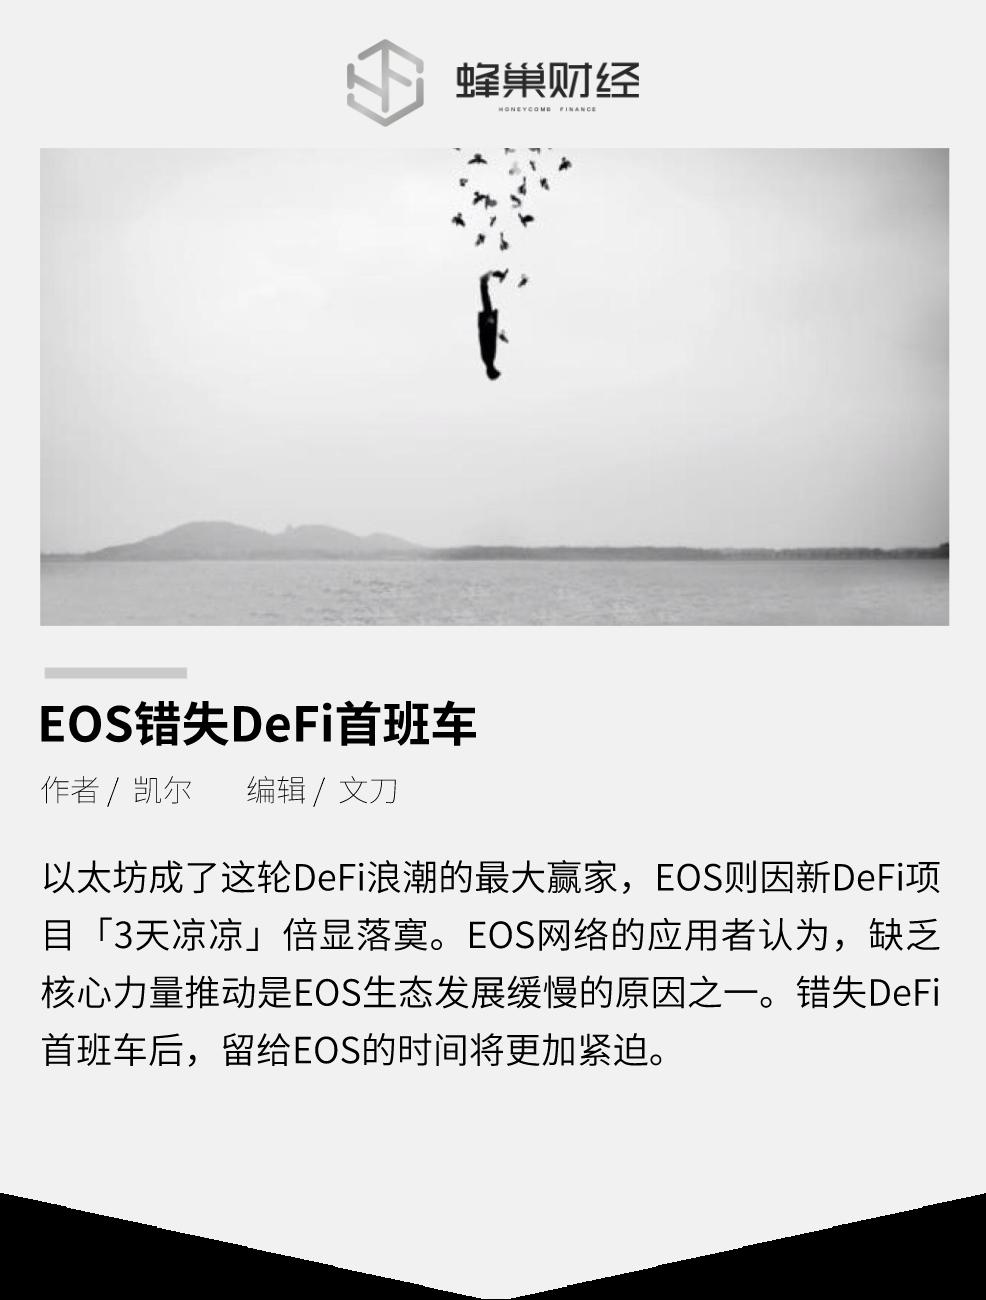 EOS错失DeFi首班车:还有希望吗?